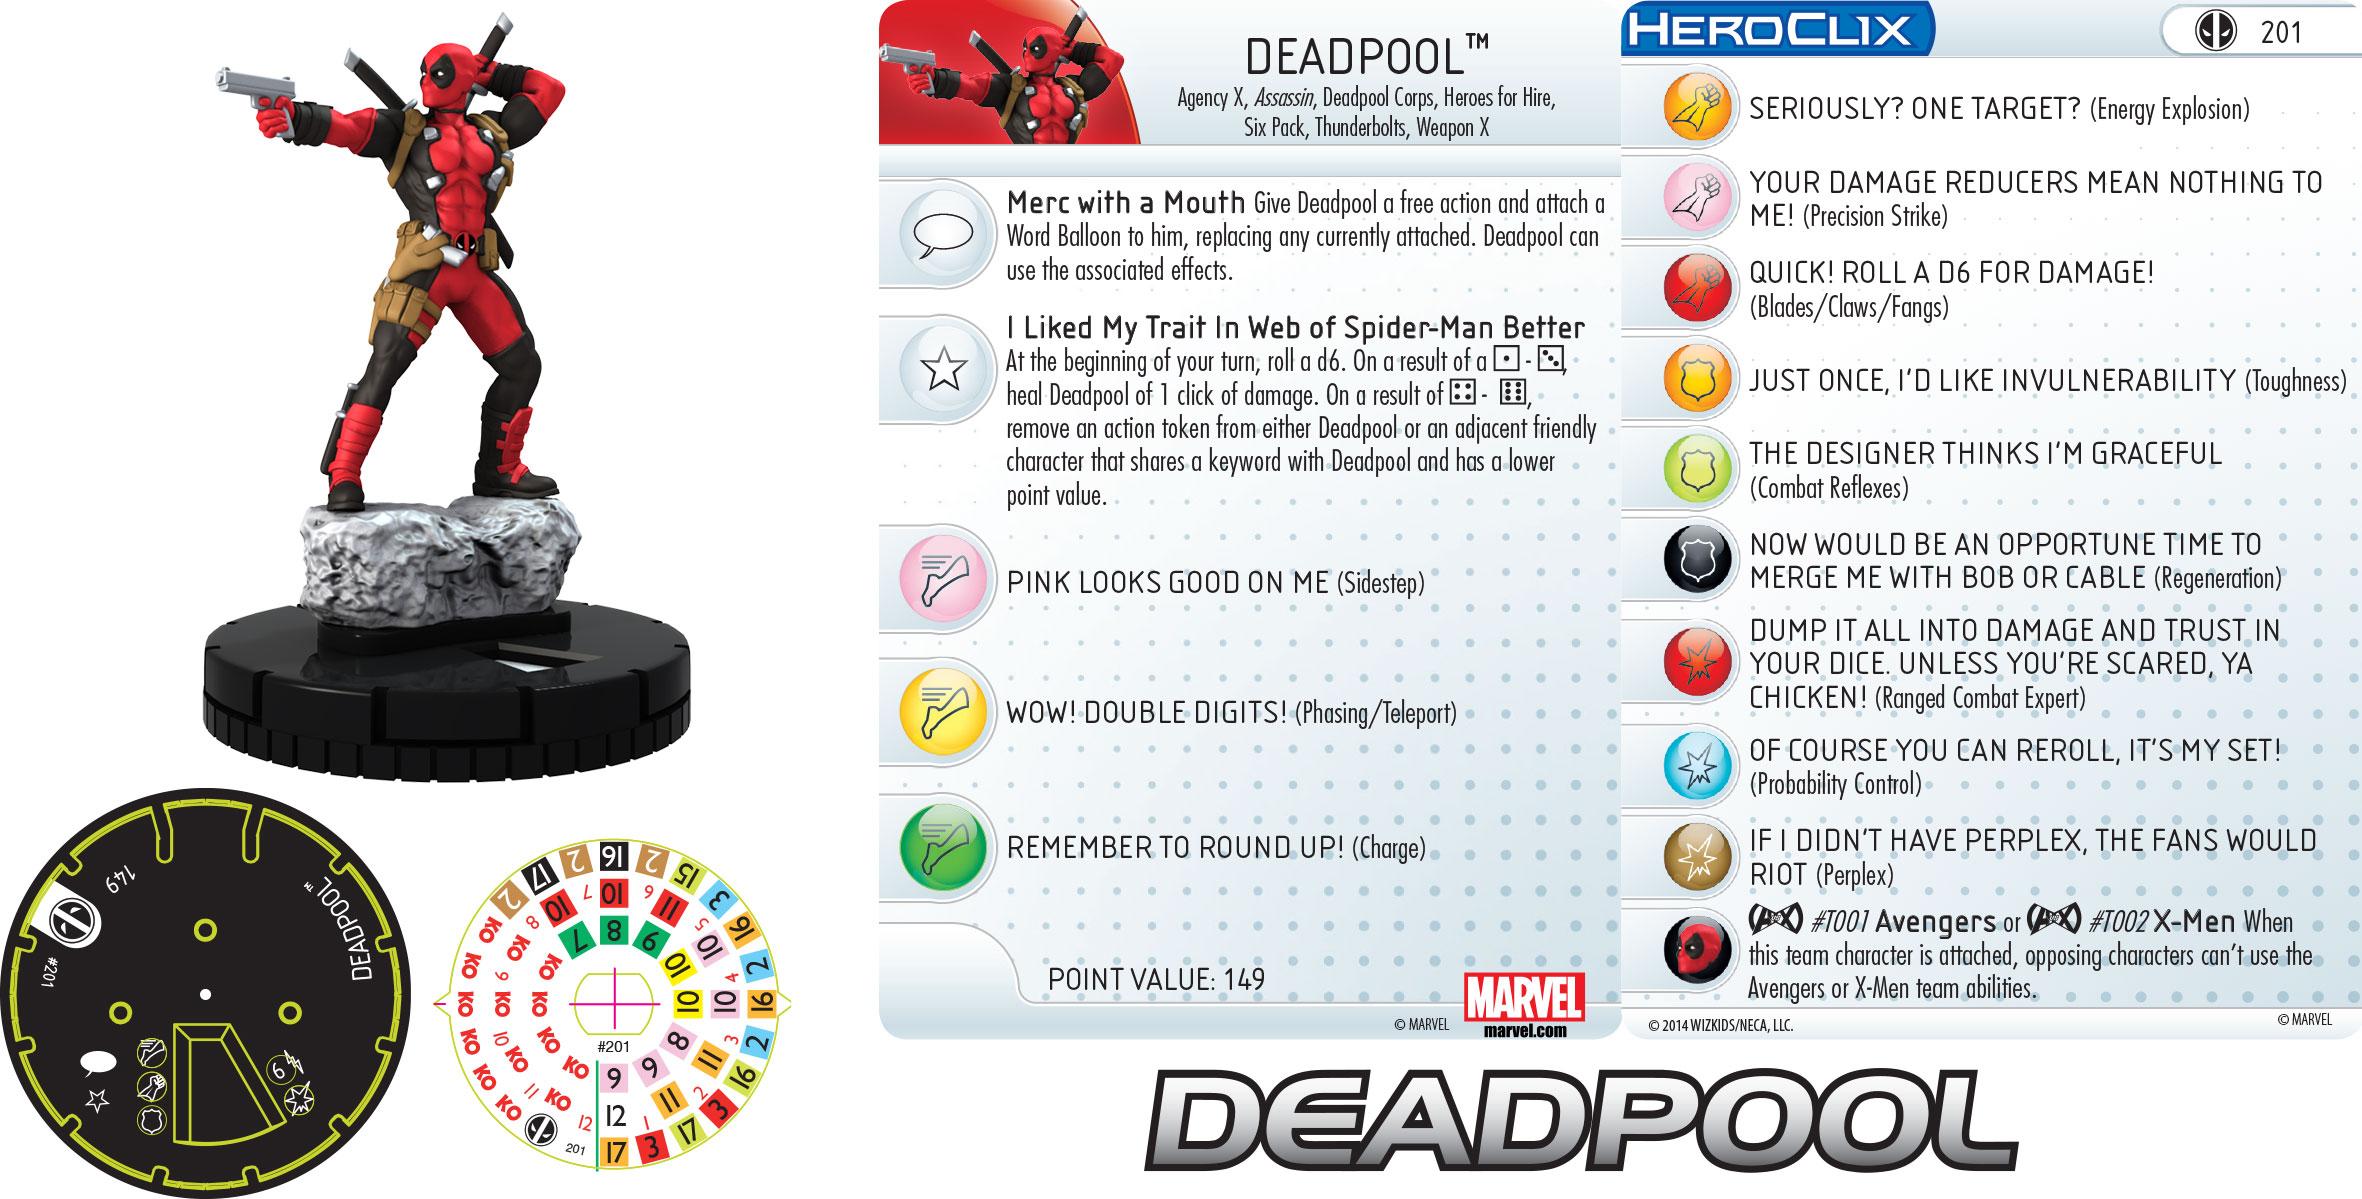 Marvel HeroClix: Deadpool